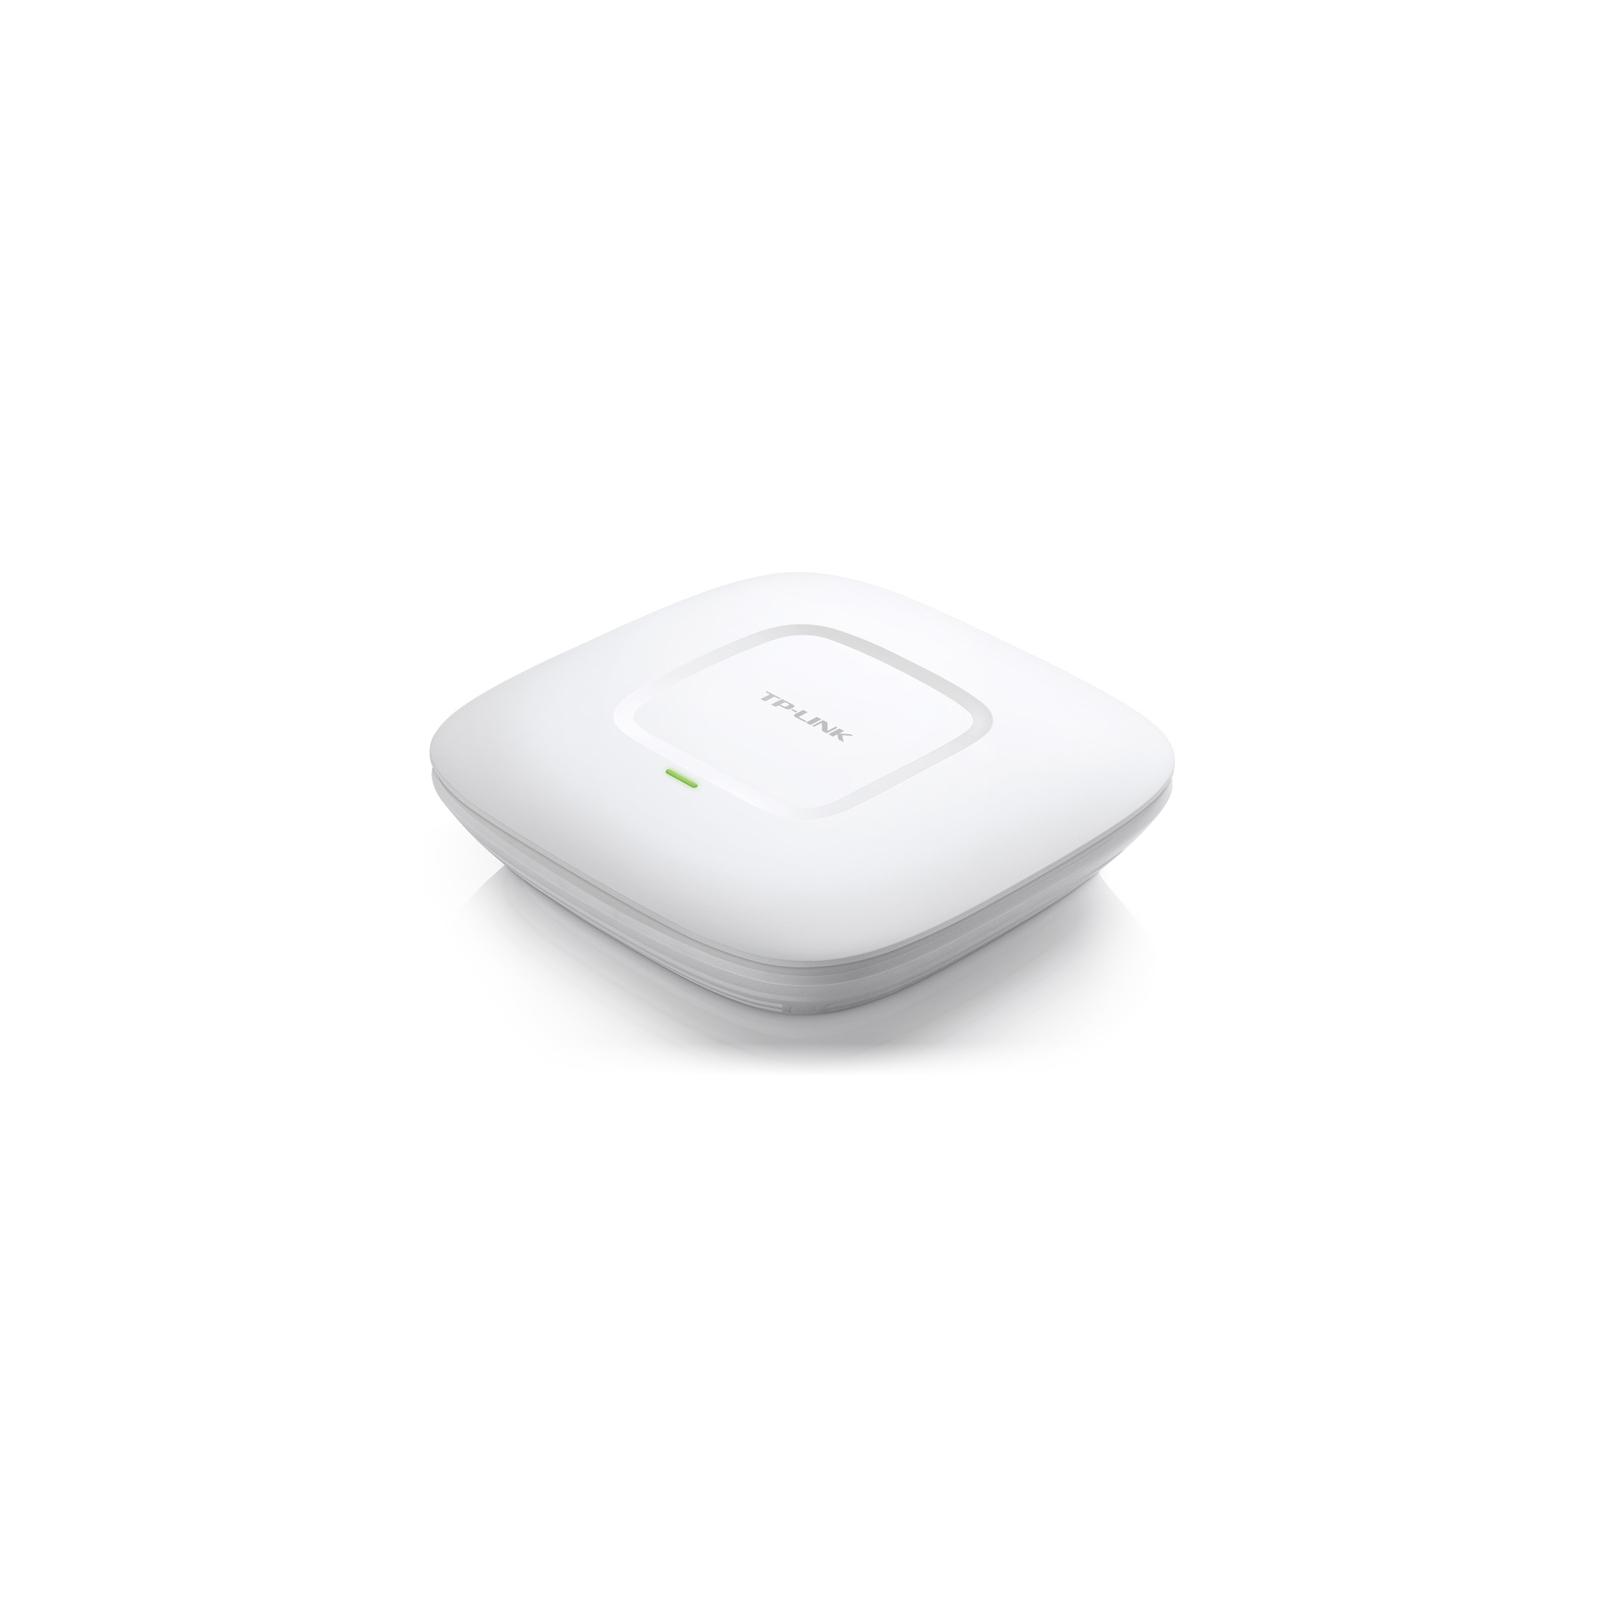 Точка доступа Wi-Fi TP-Link EAP220